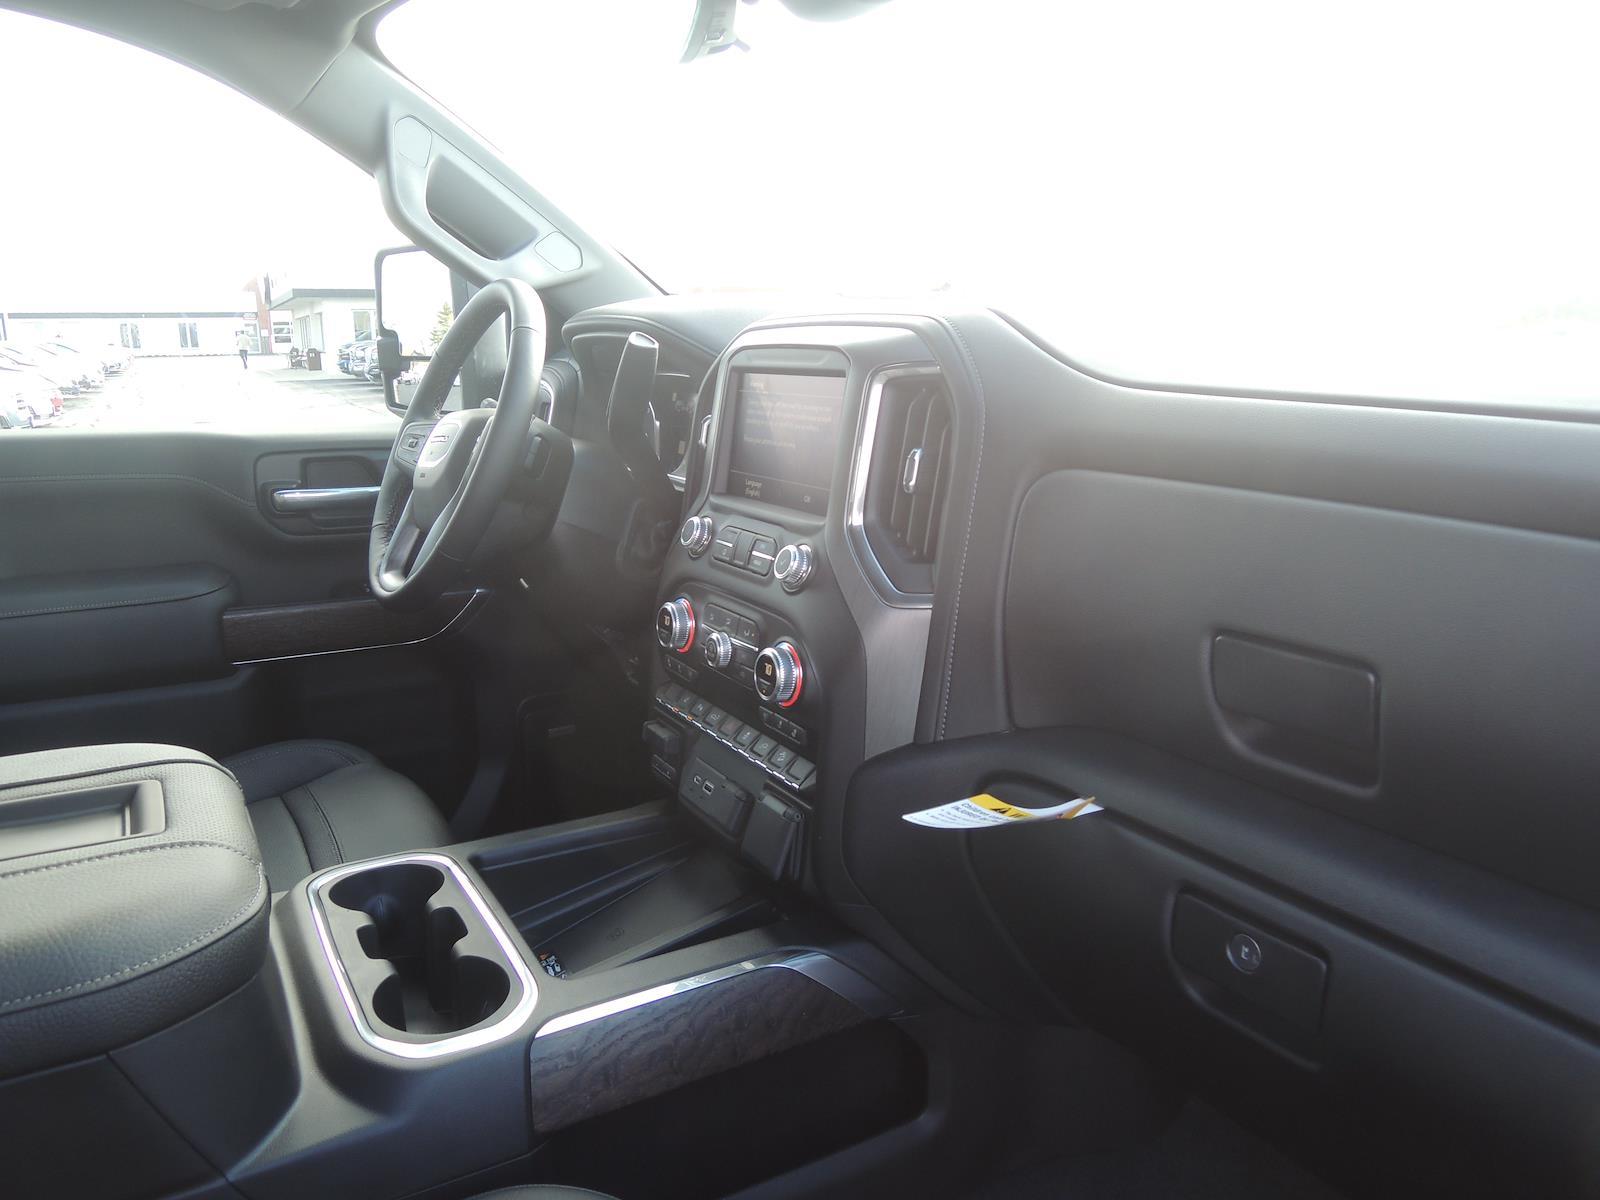 2021 GMC Sierra 2500 Crew Cab 4x4, Pickup #MT488 - photo 16